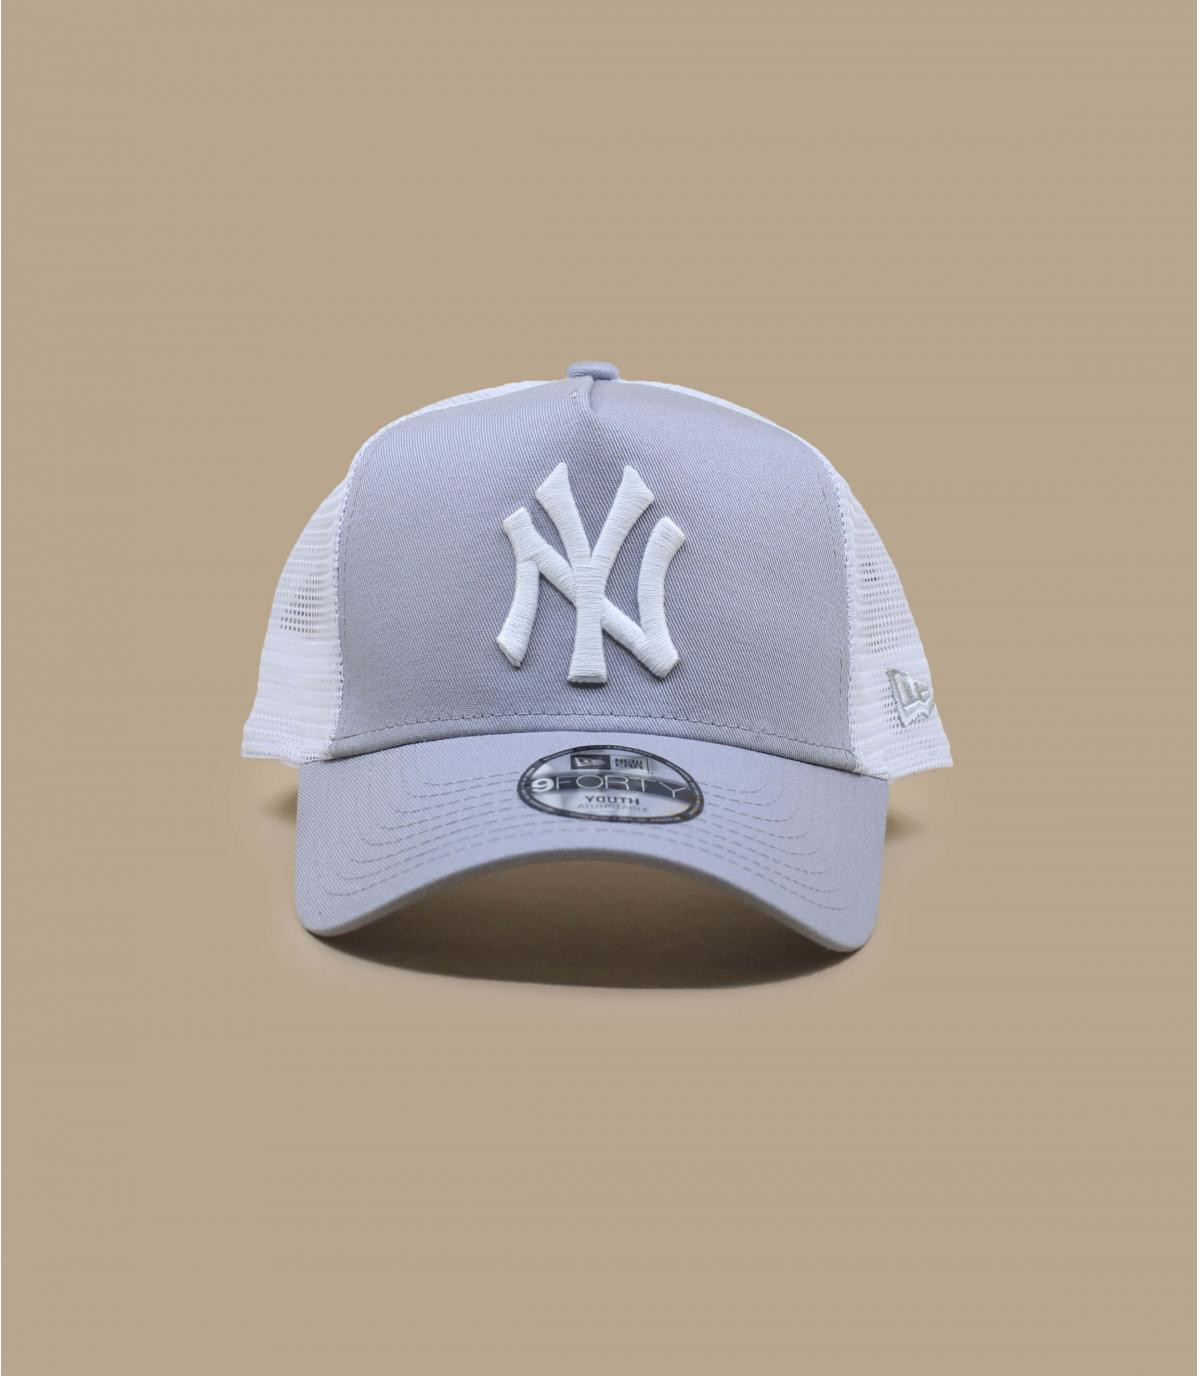 Details Trucker Cap Kids NY League Ess 940 grey - Abbildung 2